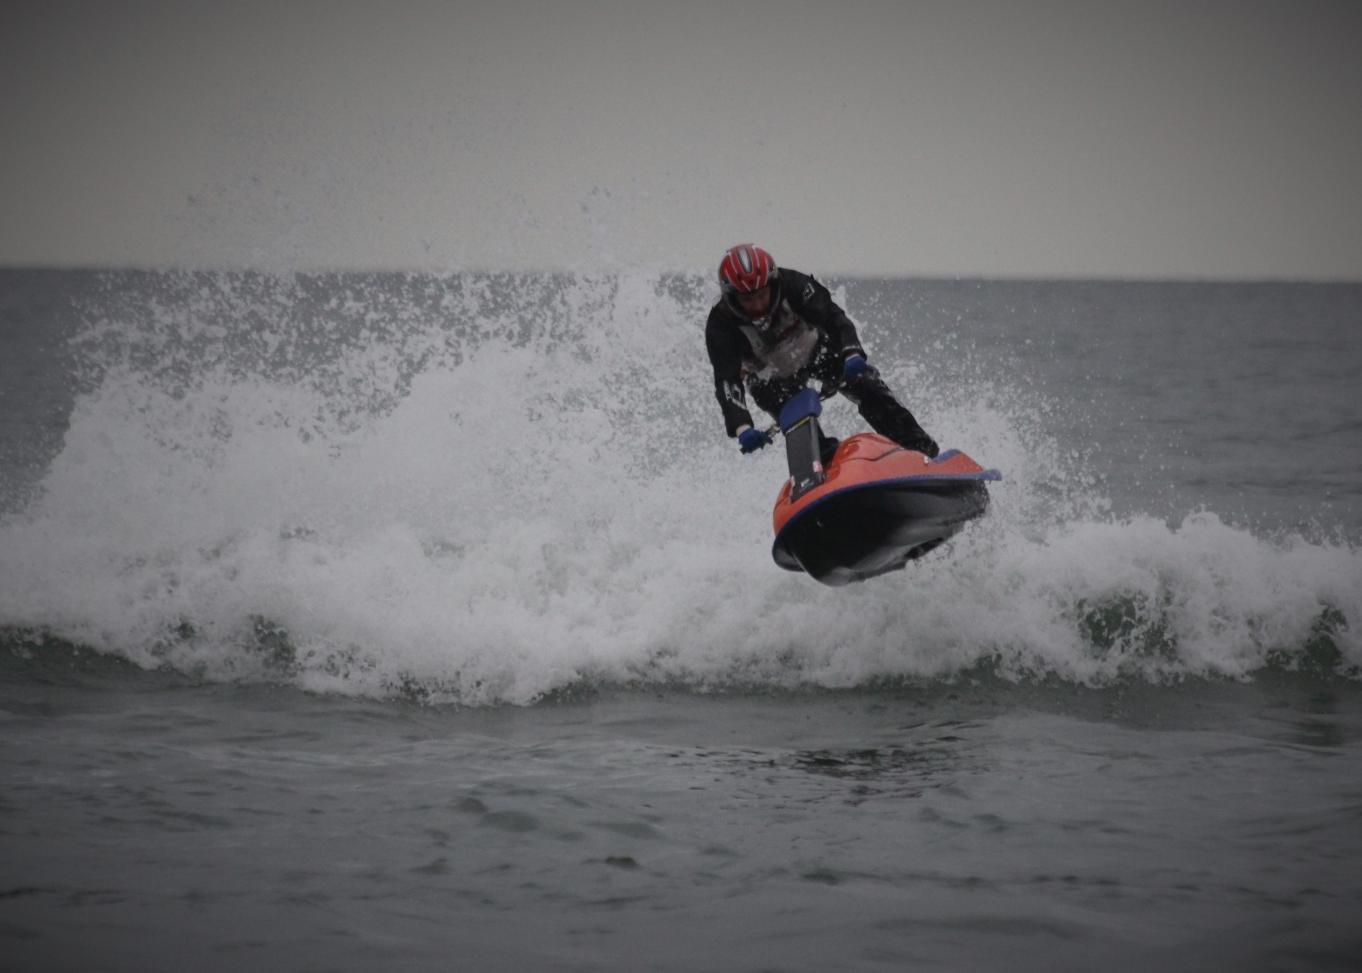 Cool backflip shot on ski!  Daytona Freeride 2014-img_38786.jpg